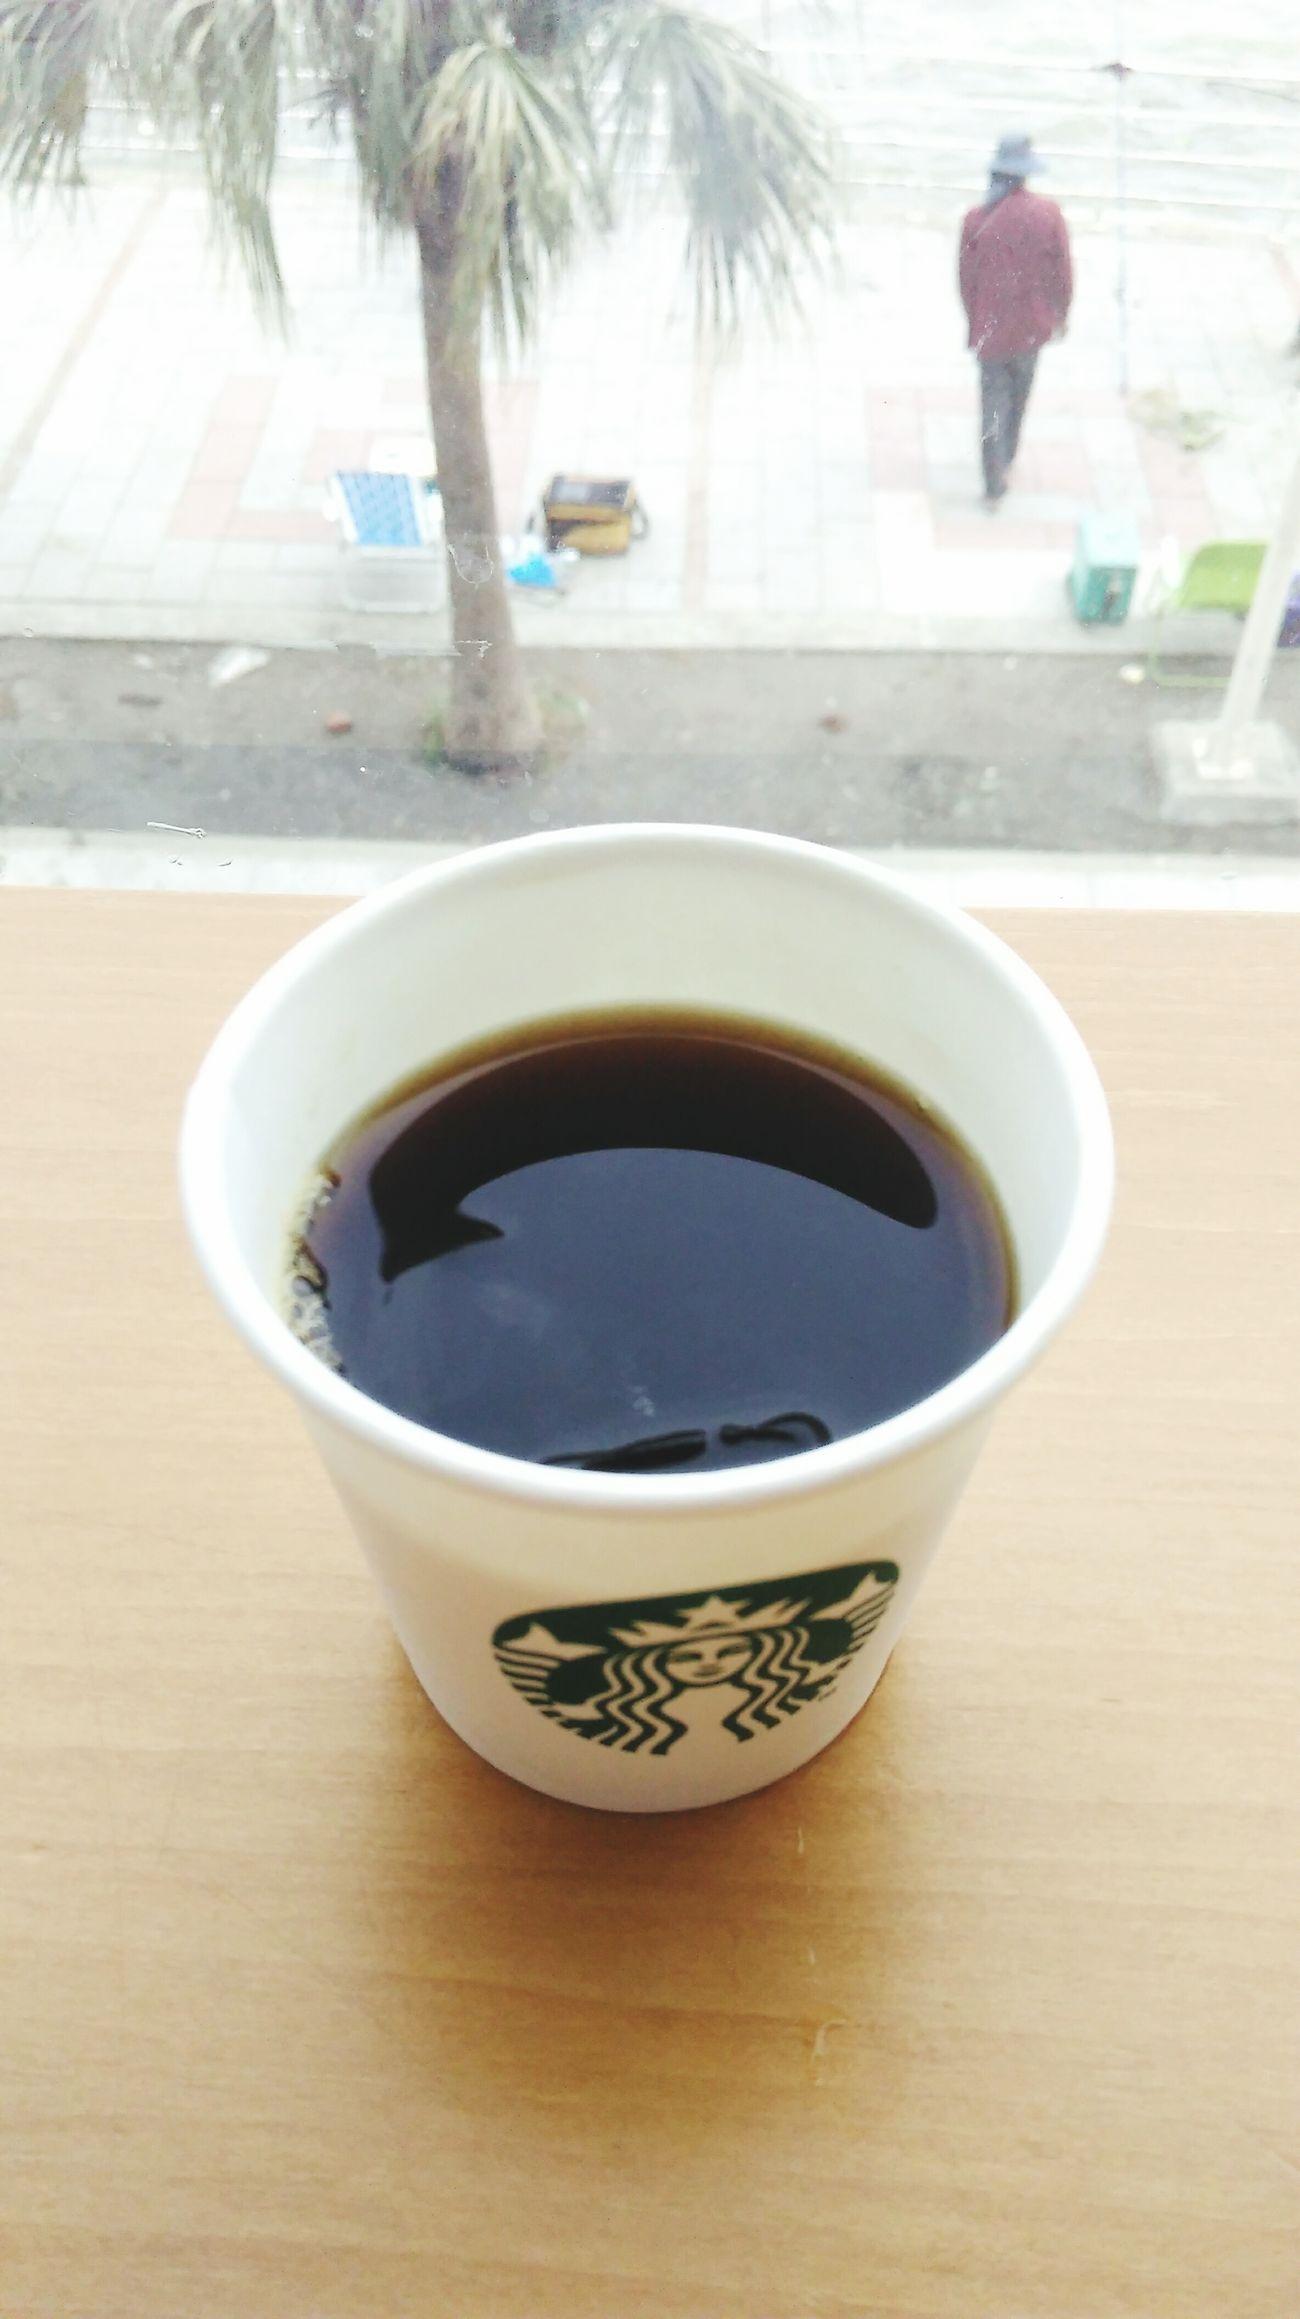 Coffee Coffee Break Enjoying Life Hello World On A Date Relaxing Hi!